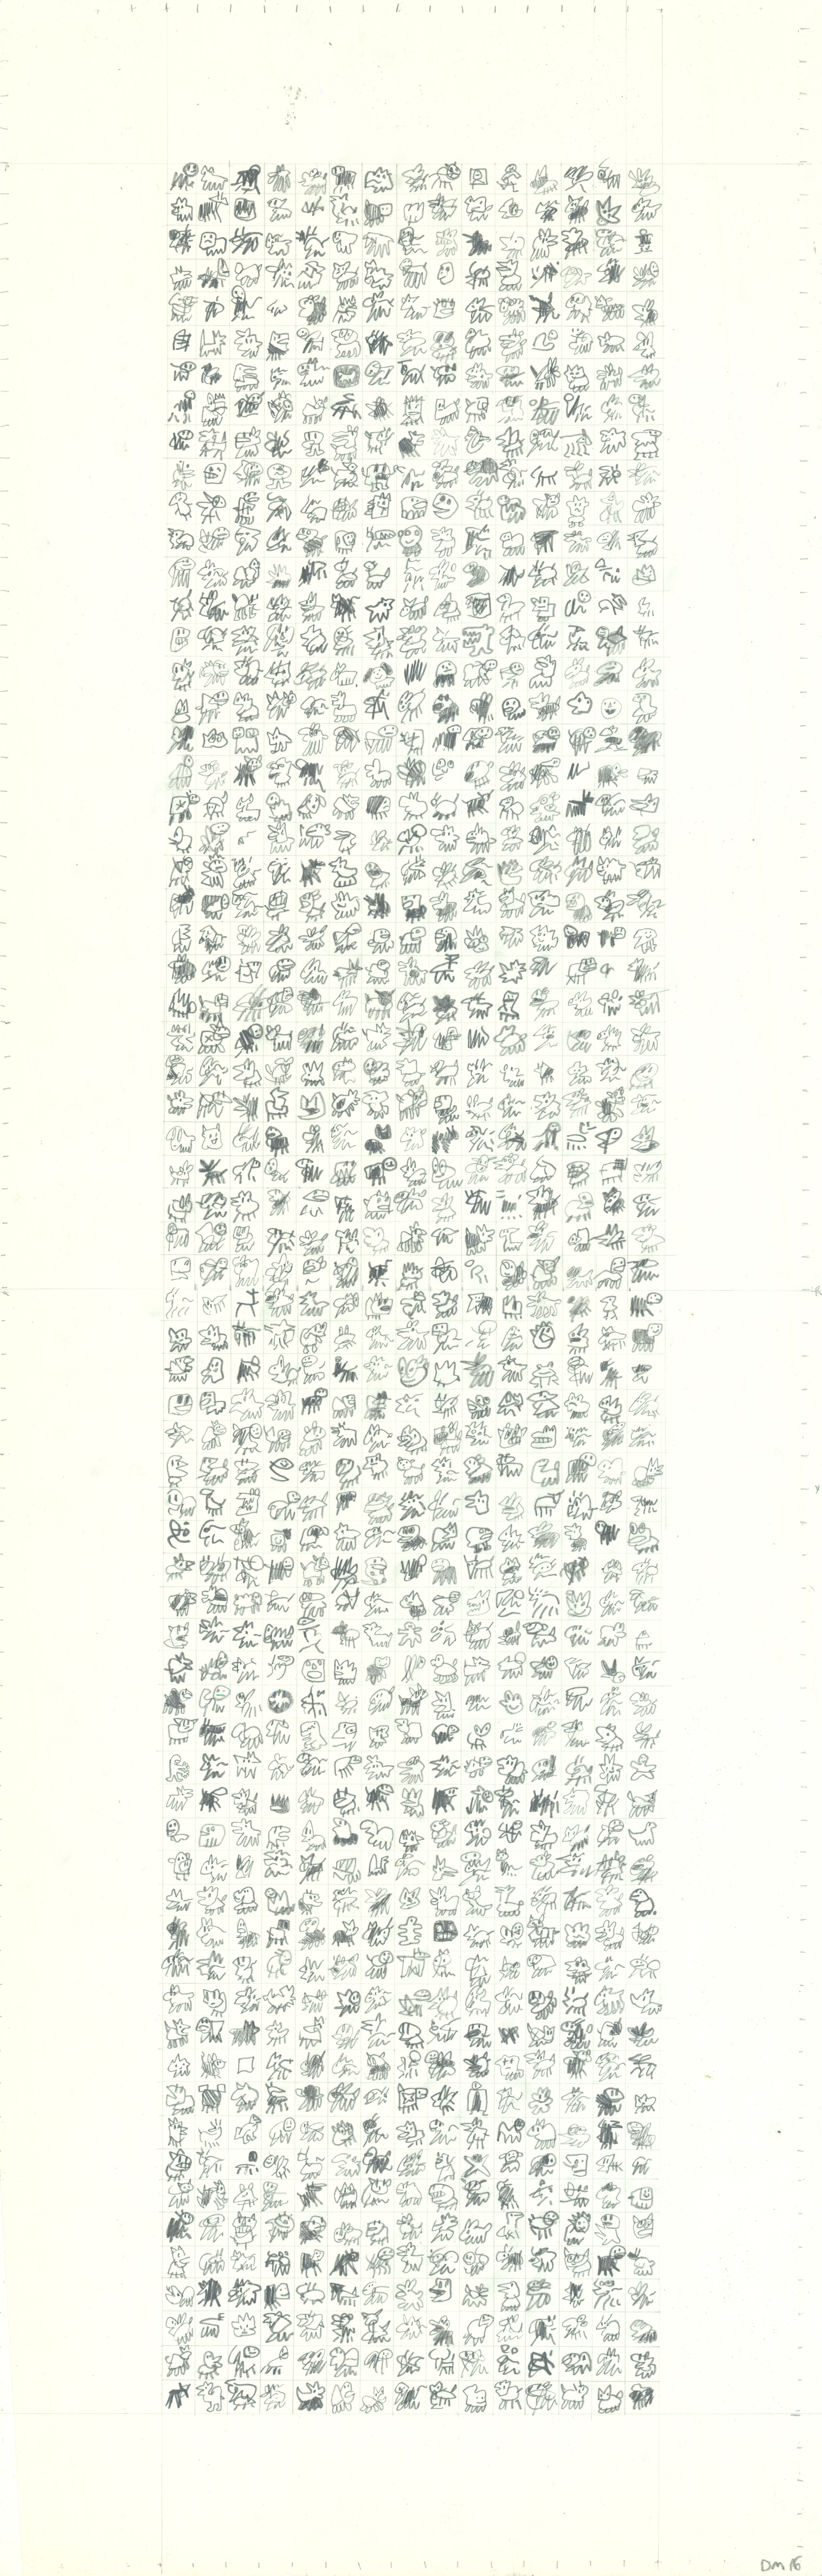 Scan-0003.jpg